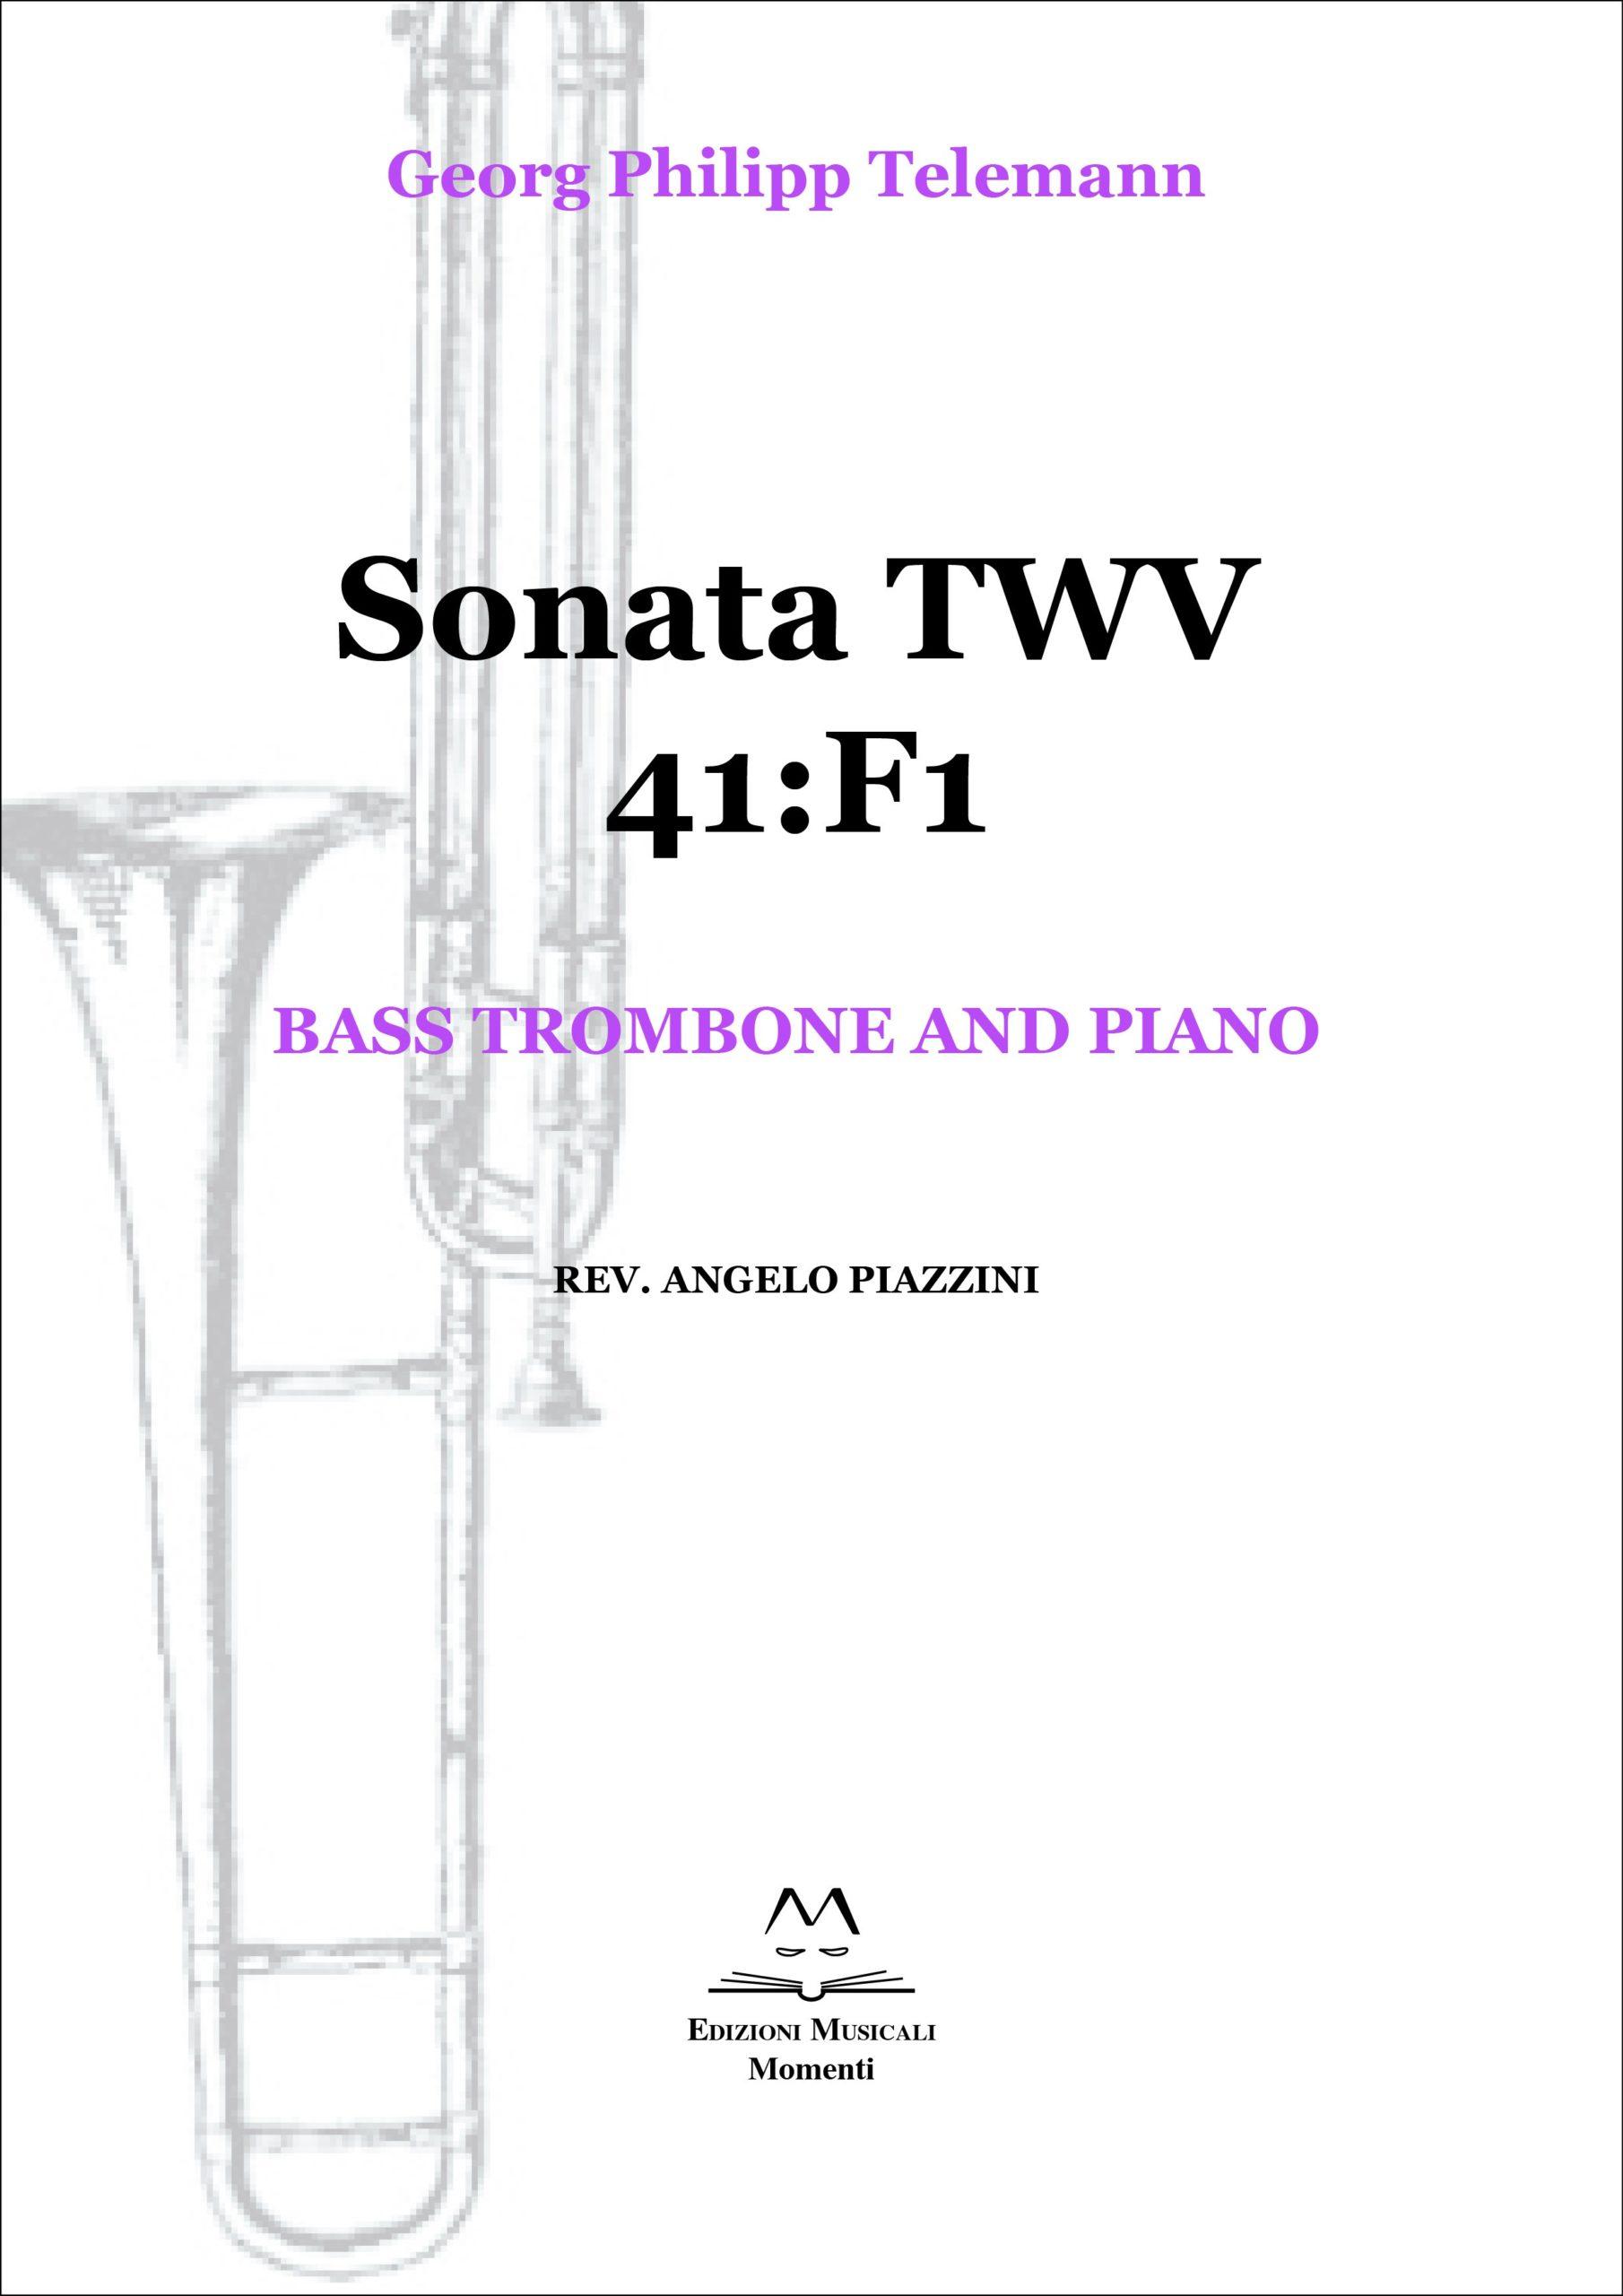 Sonata TWV 41:F1 - Bass trombone and piano rev. Angelo Piazzini